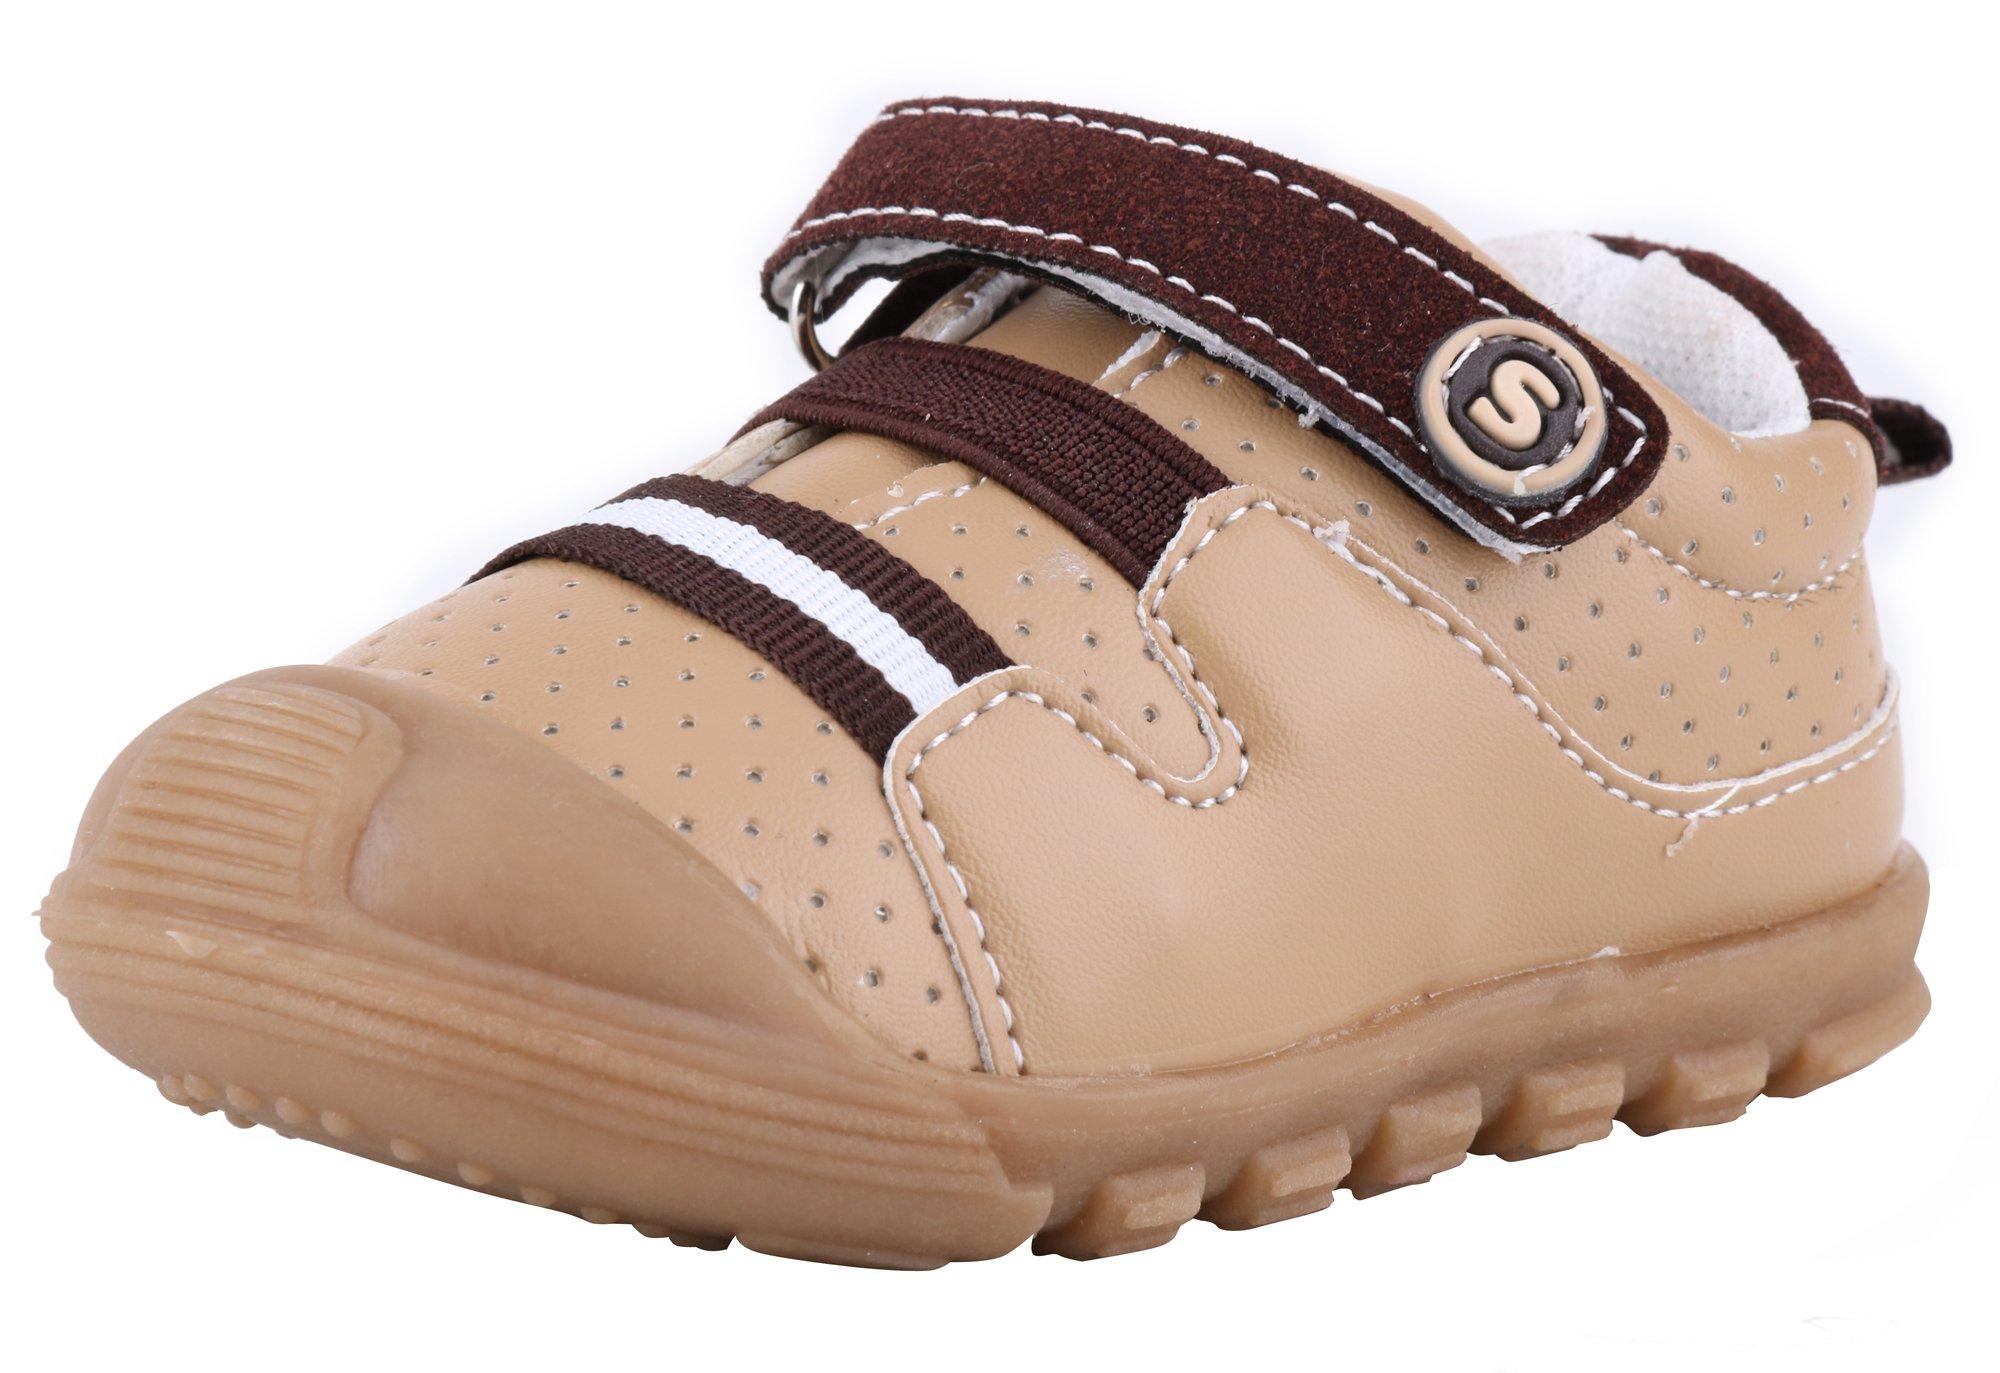 LONSOEN Baby Boys and Girls Anti-Slip Walking Shoes Toddler Athletic Sneaker BAY001 Brown CN19